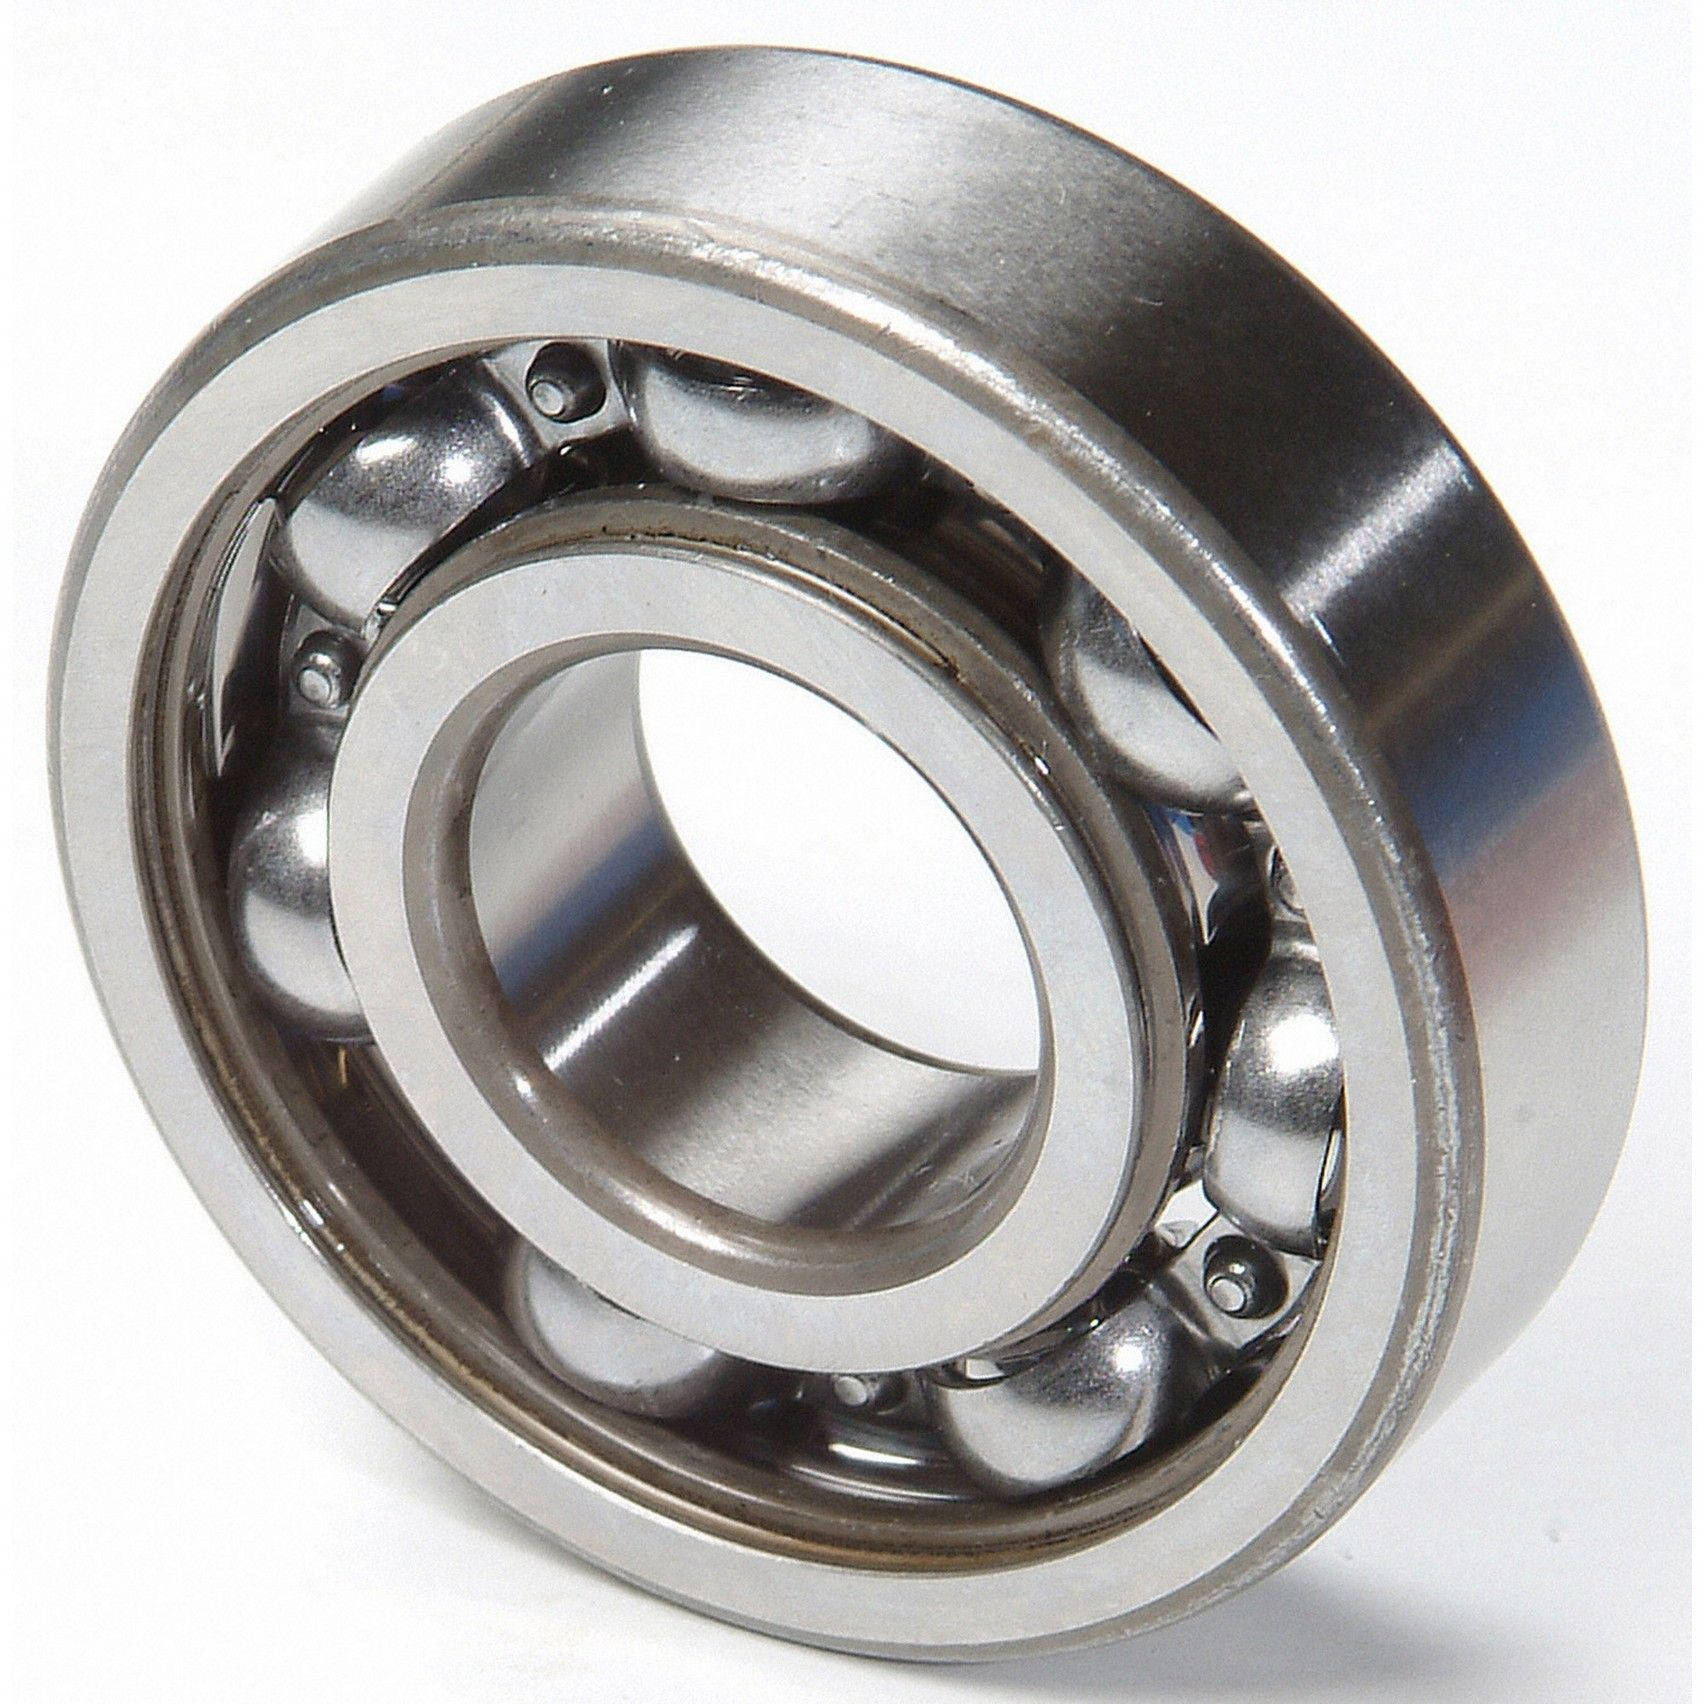 Manual Trans Input Shaft Bearing Replacement (Beck Arnley ...